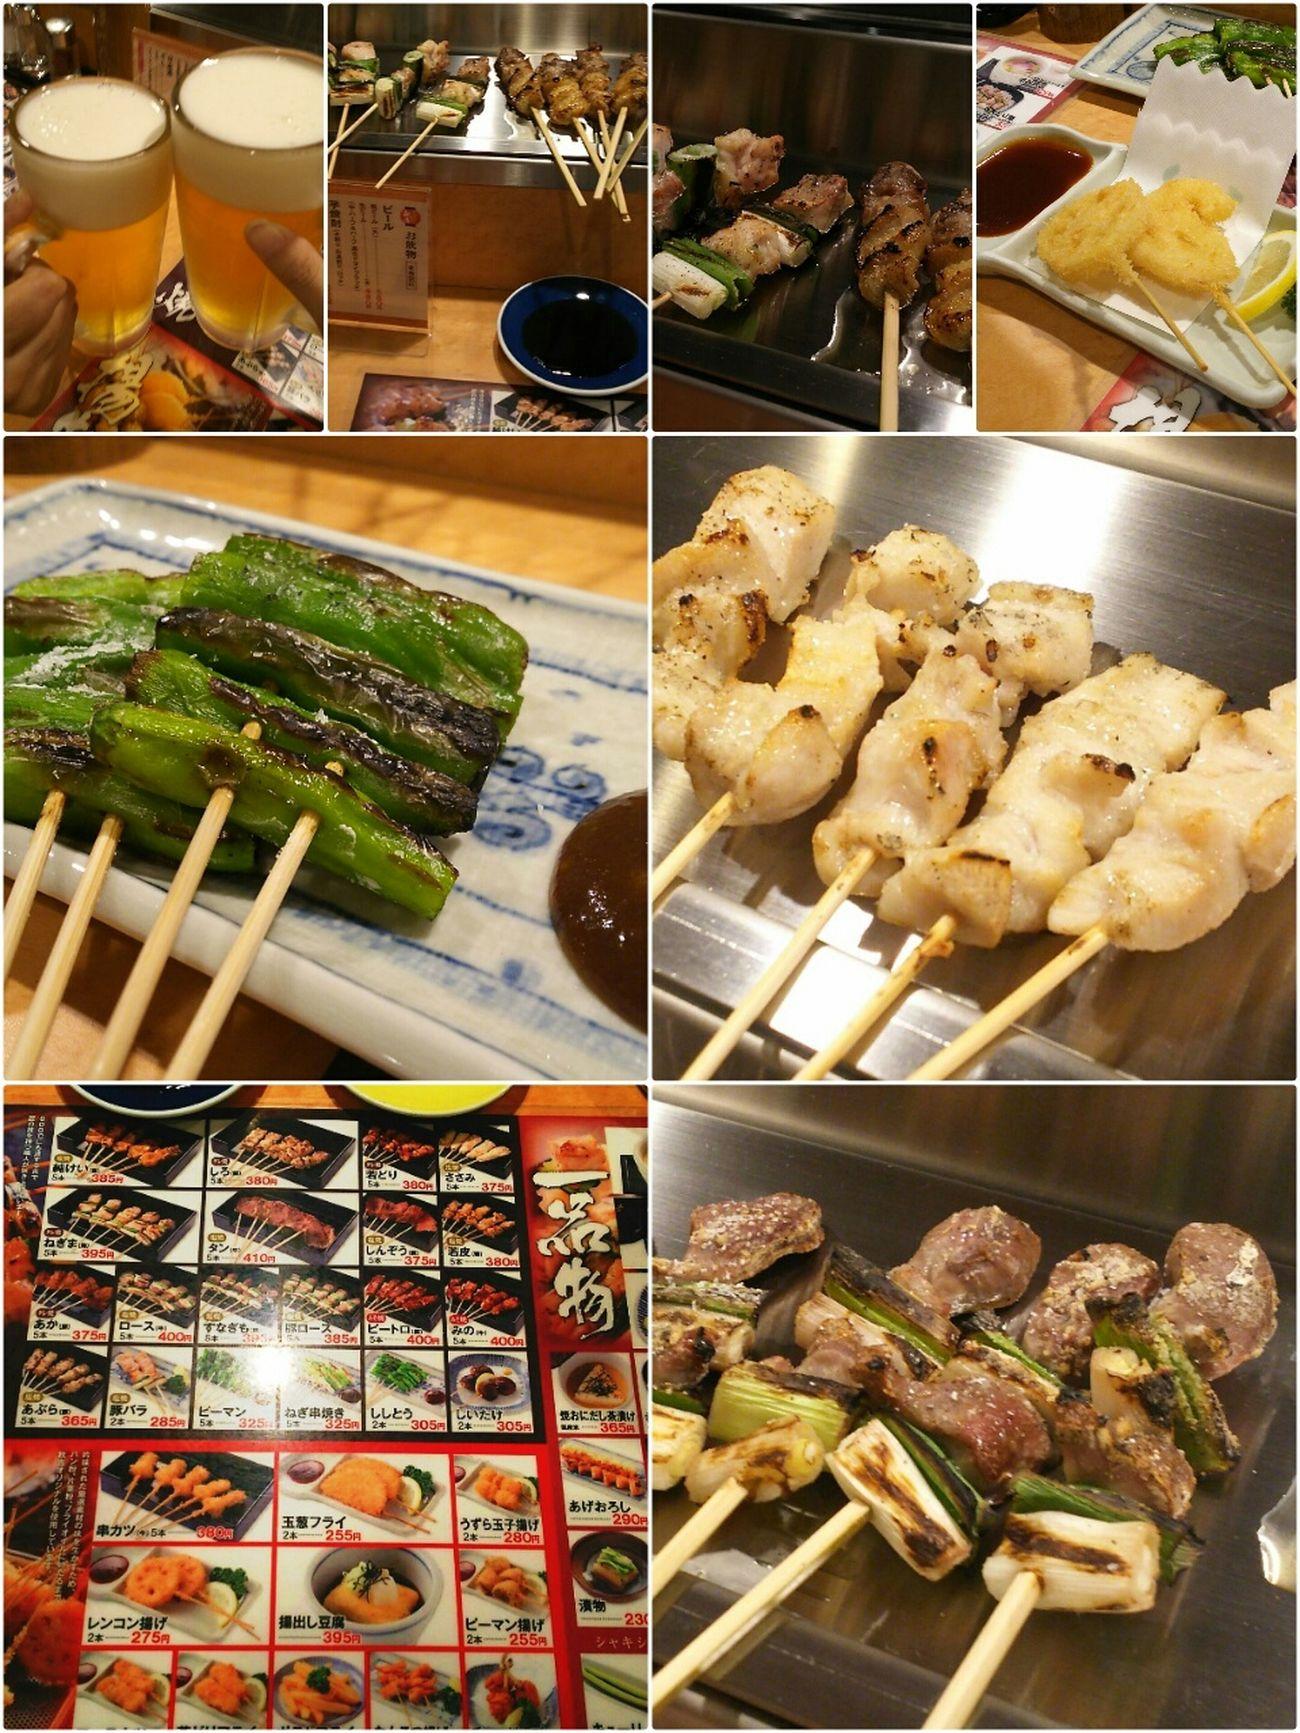 Tokyo Ikebukuro Ikebukuro Foodporn In My Mouf Food Photography Enjoy A Meal Food Porn Enjoying A Meal やきとり お酒 秋吉(ºωº)小ぶりですが5本セット!お手軽に飲み食べ出来ます!